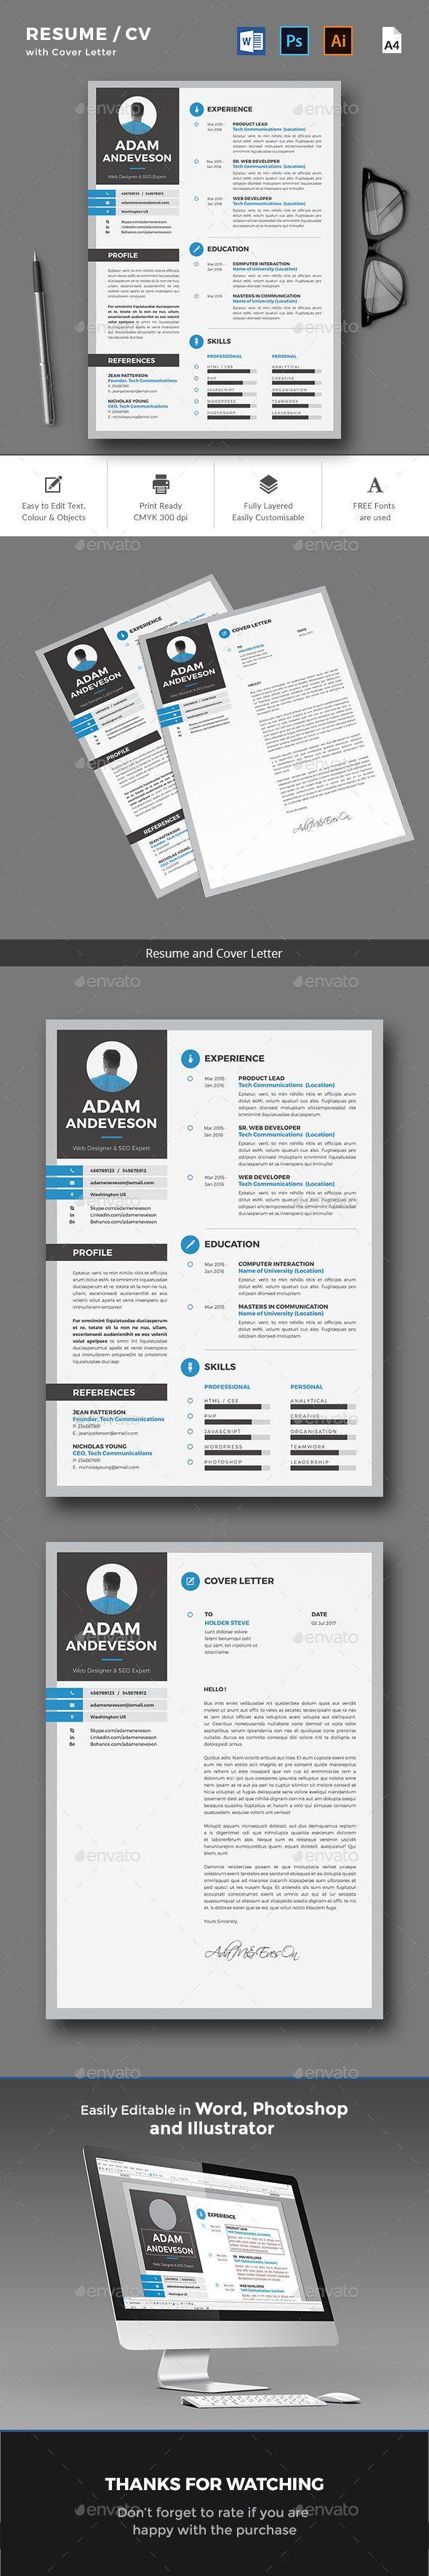 Resume / CV Template PSD, AI, MS Word